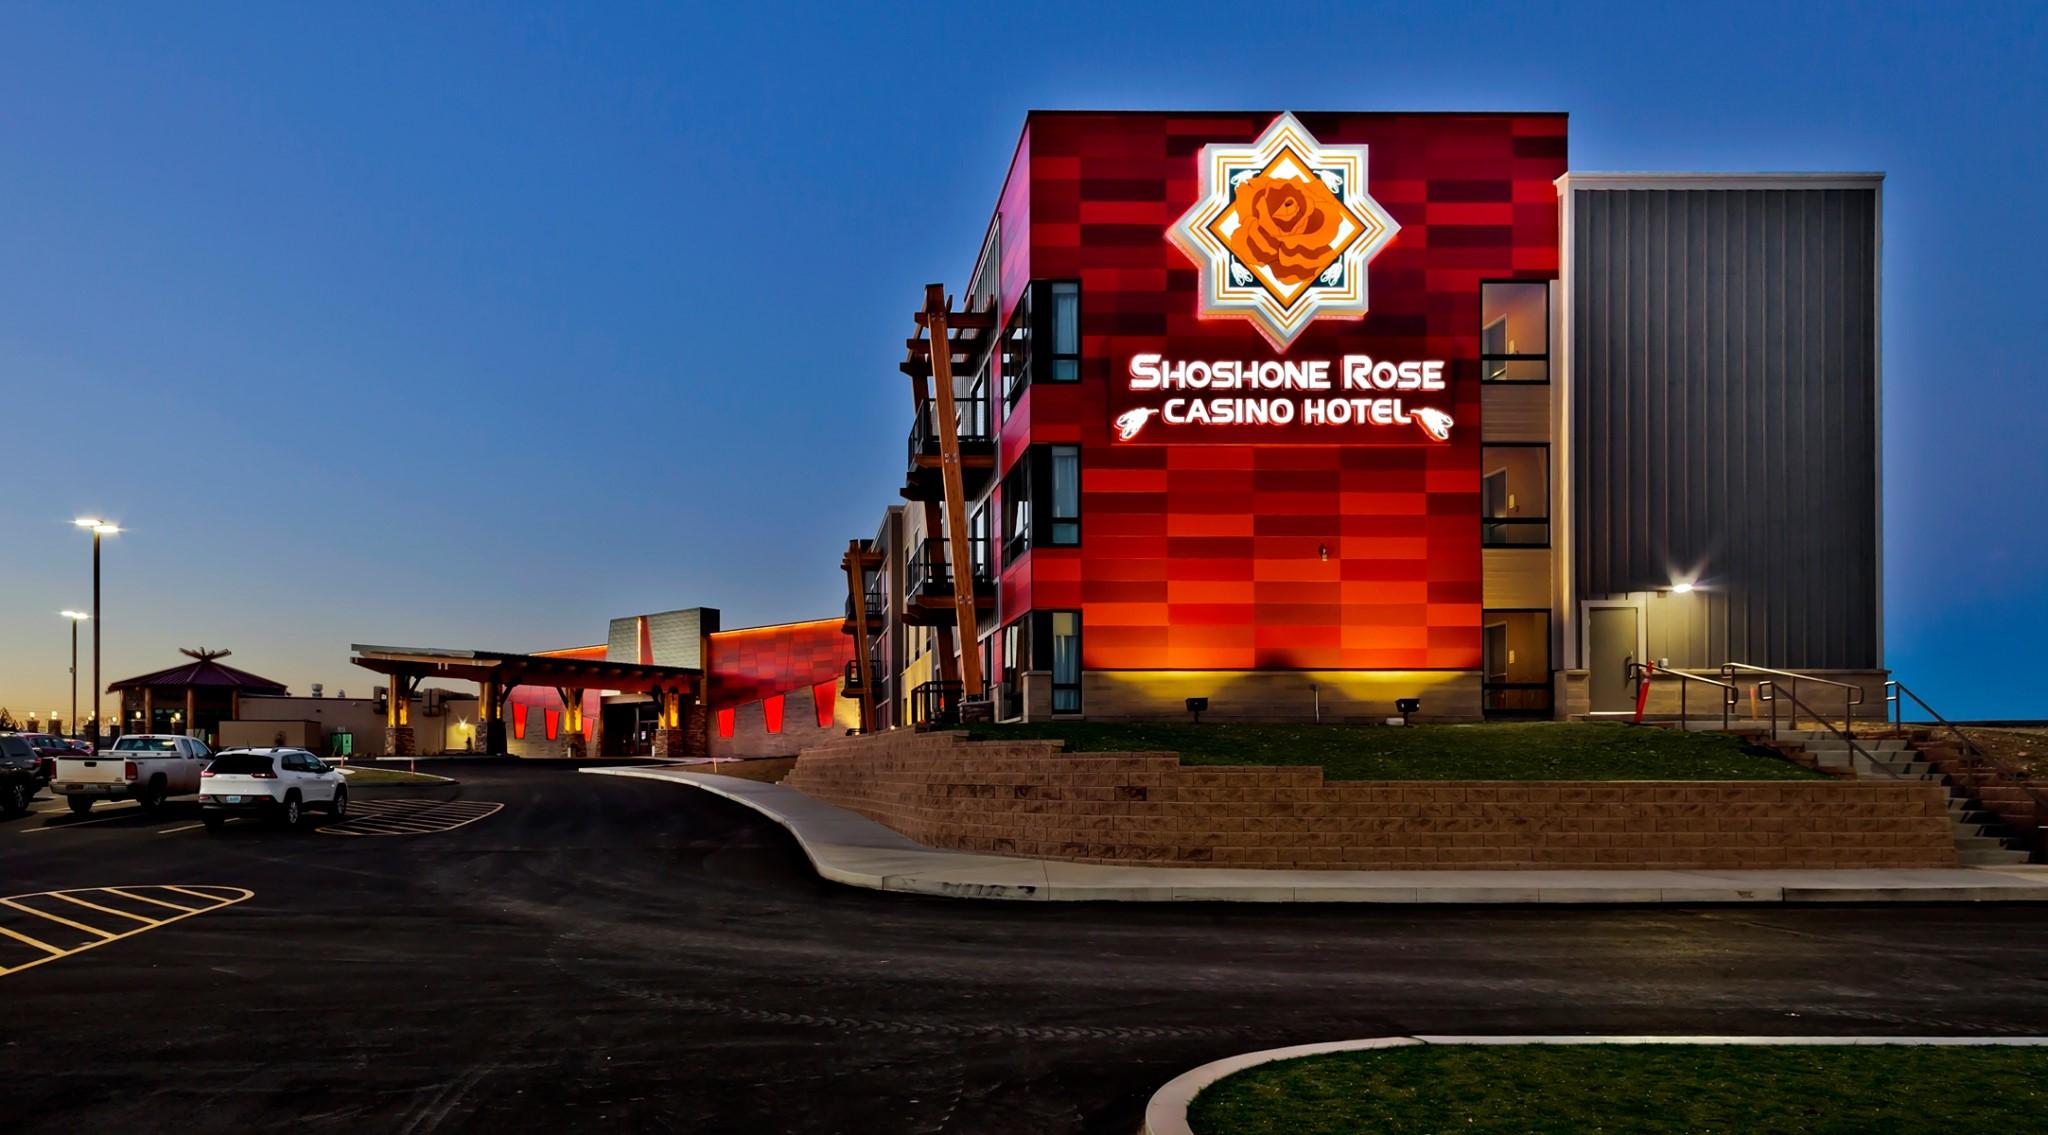 Shoshone Rose Casino & Hotel Temporarily Closed for COVID-19